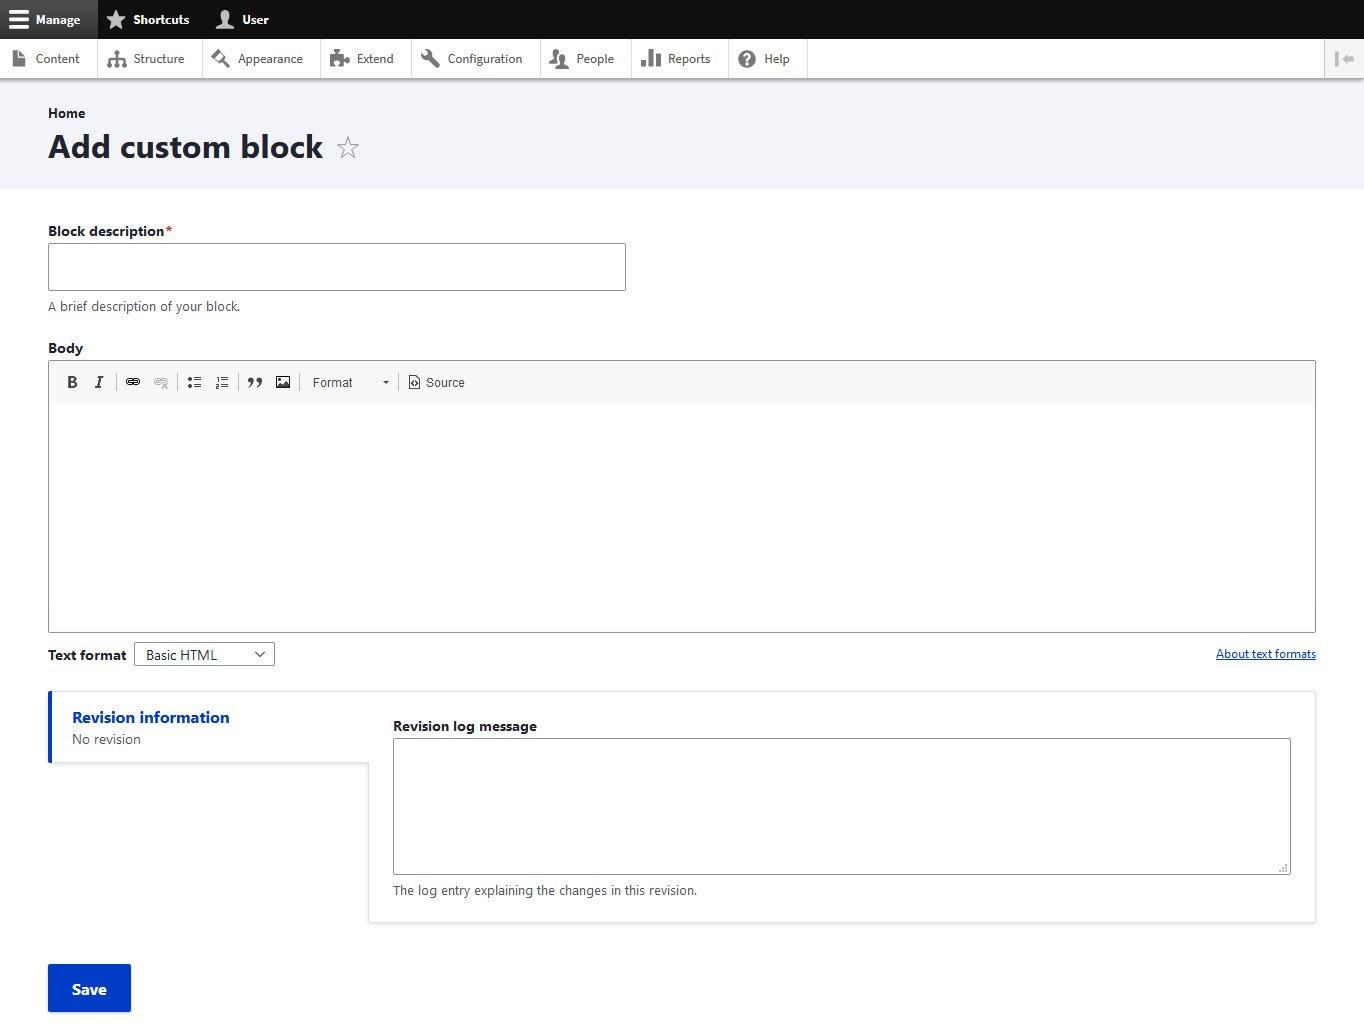 add custom block in drupal